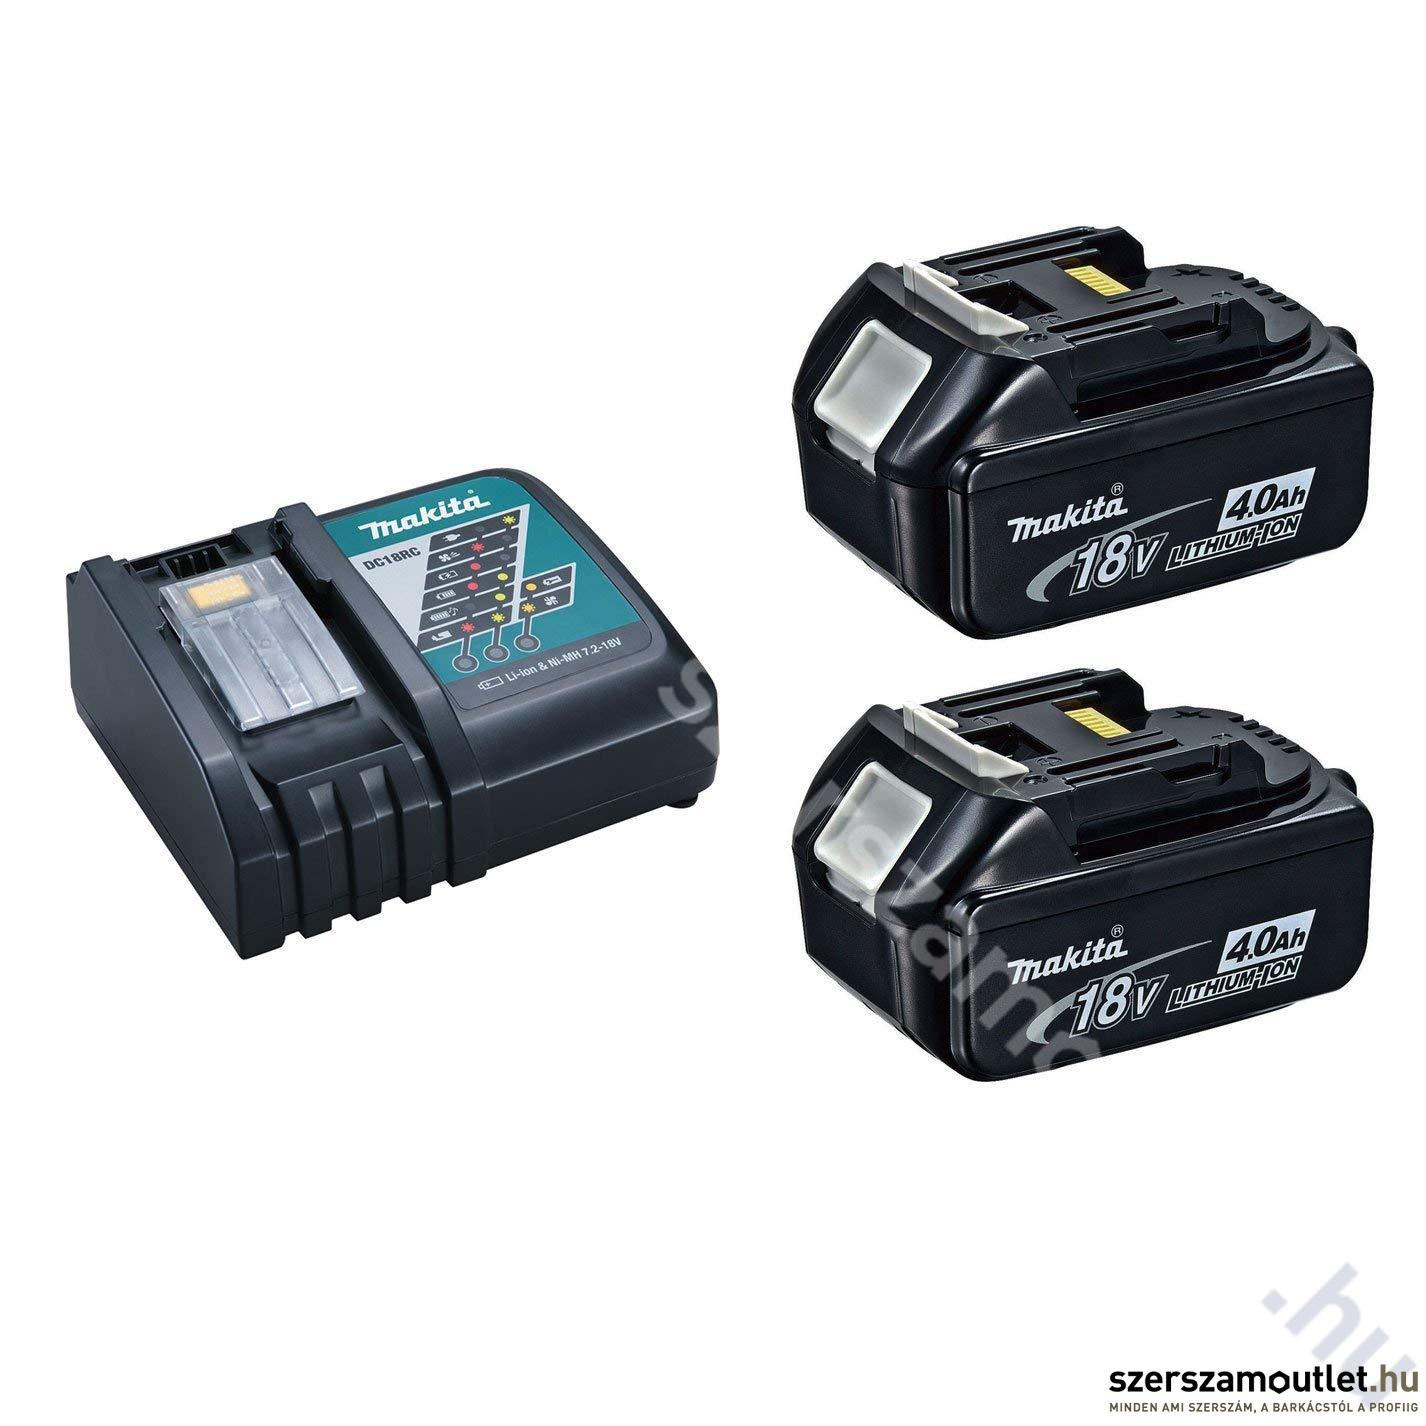 MAKITA 2db BL1840 Akkumulátor DC18RC töltő csomag (18V Li